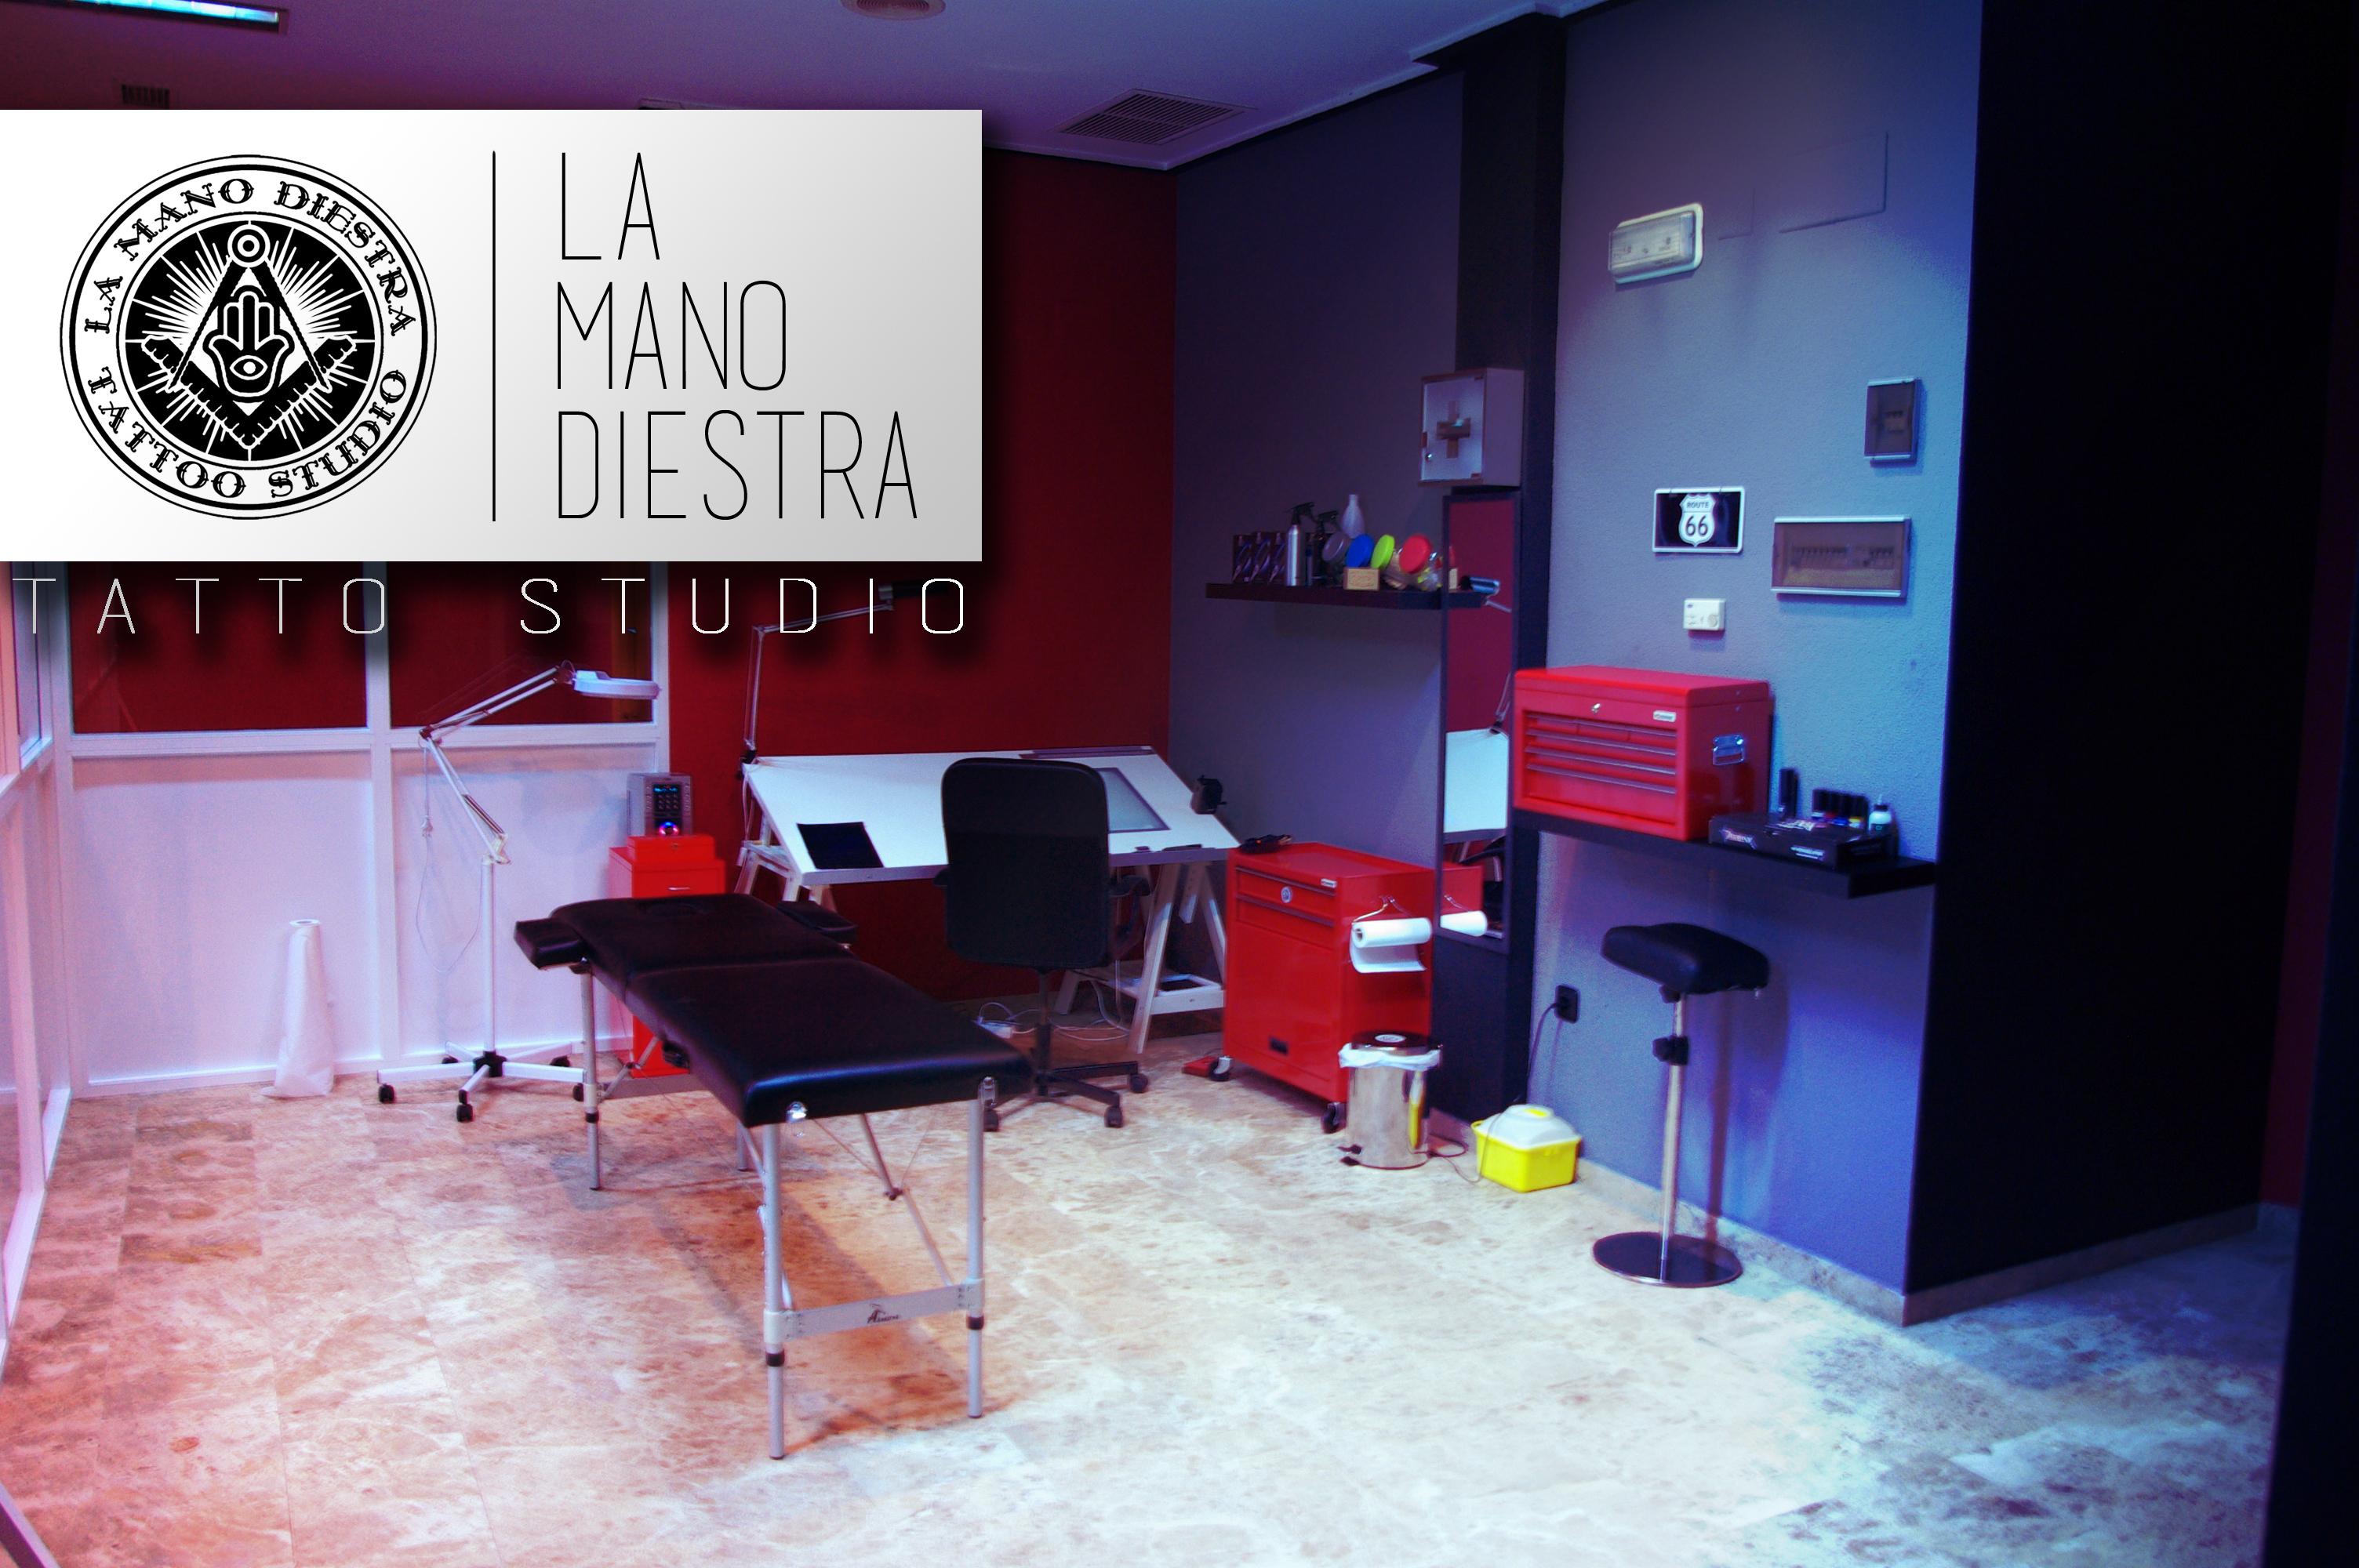 Como Hacer Un Diseño Para Tatuaje la mano diestra tattoo studio | estudio de tatuajes en